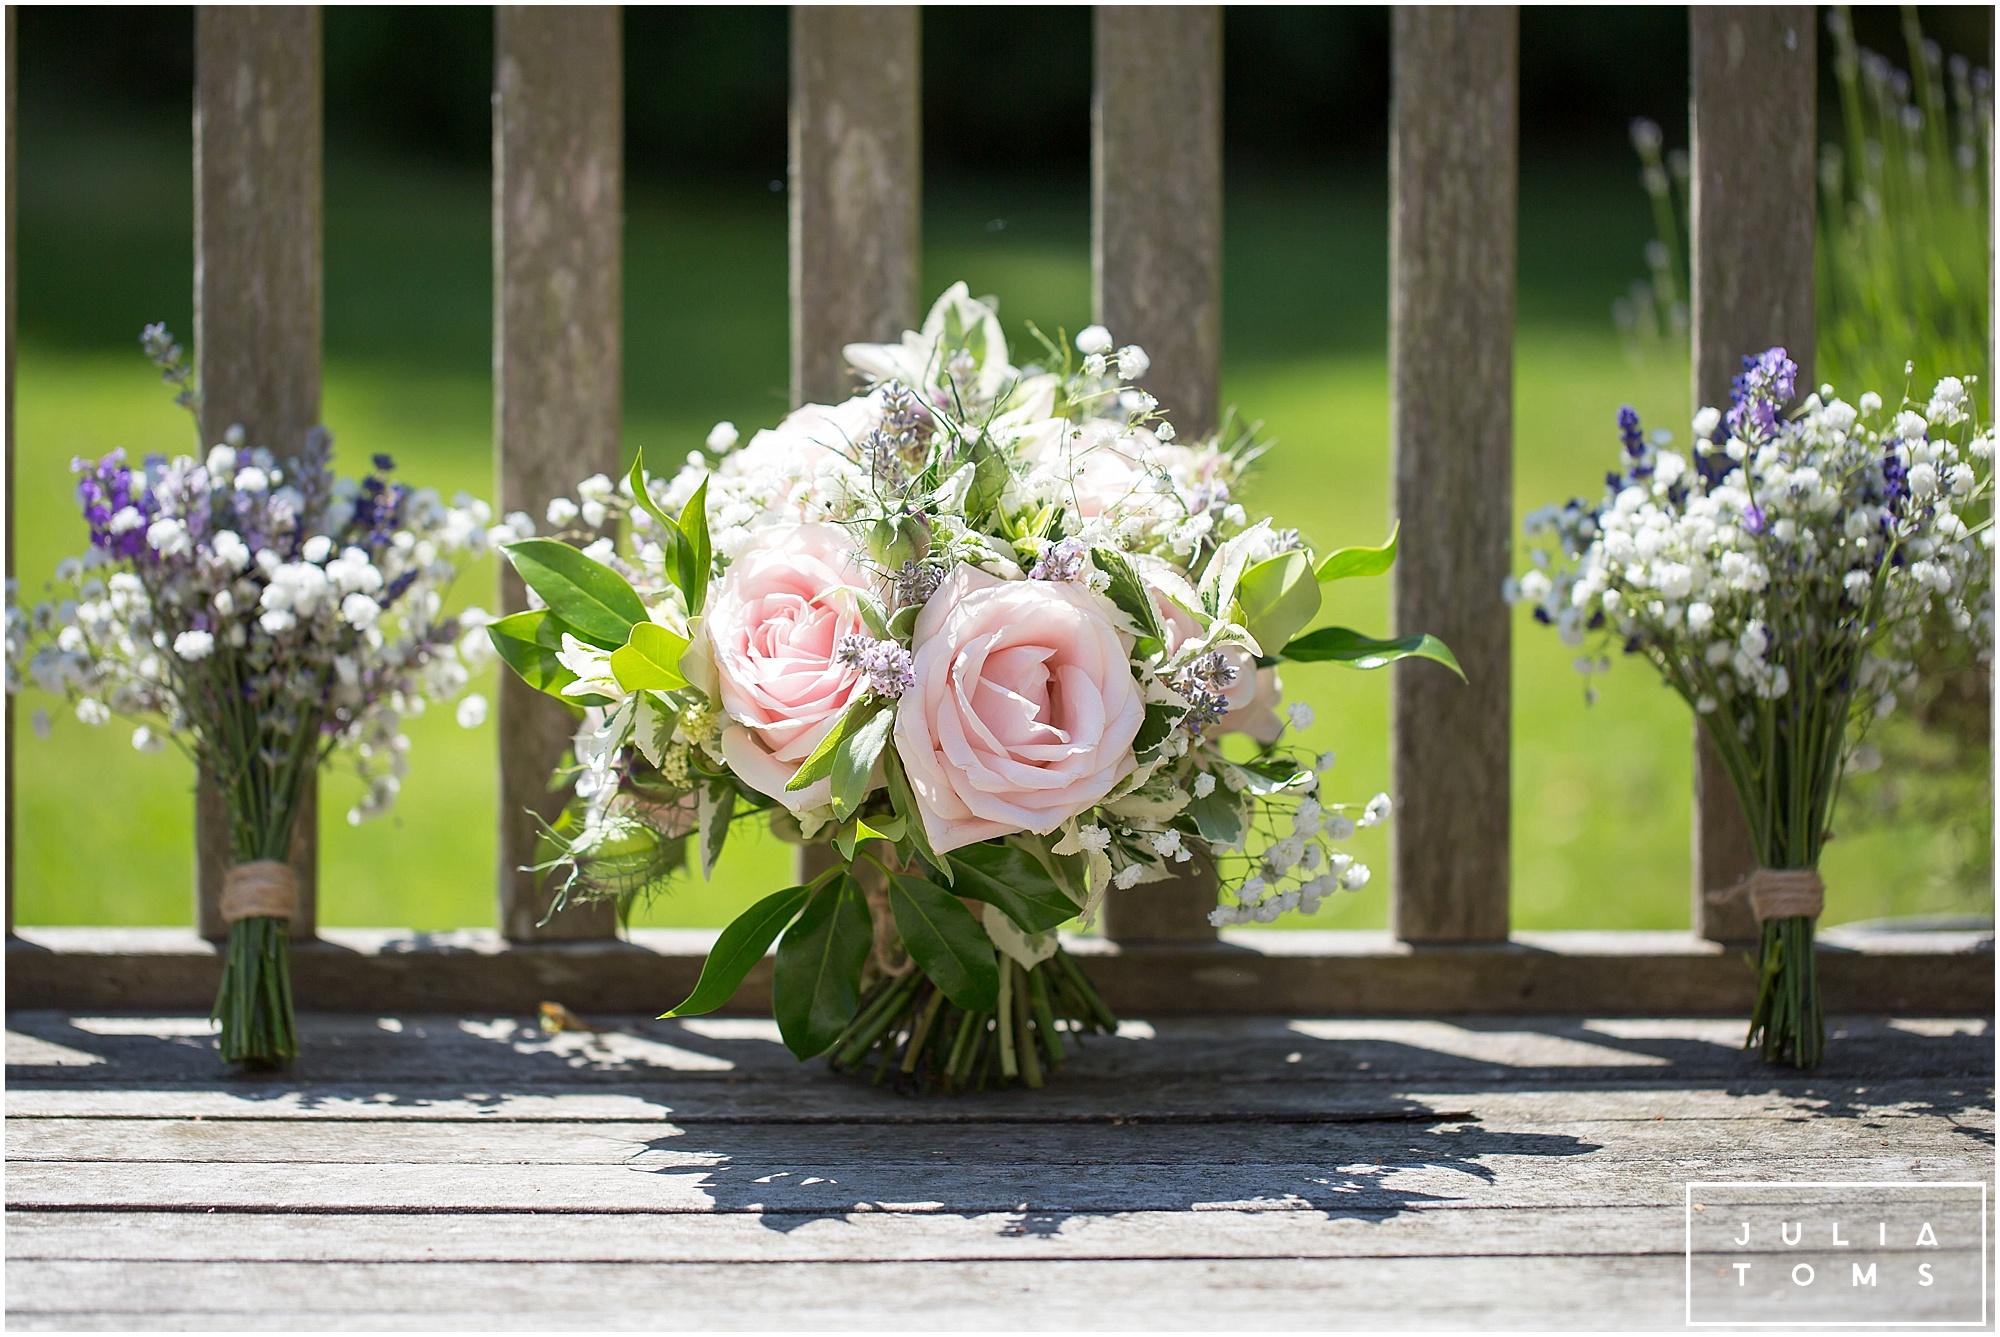 julia_toms_chichester_wedding_photographer_portsmouth_003.jpg